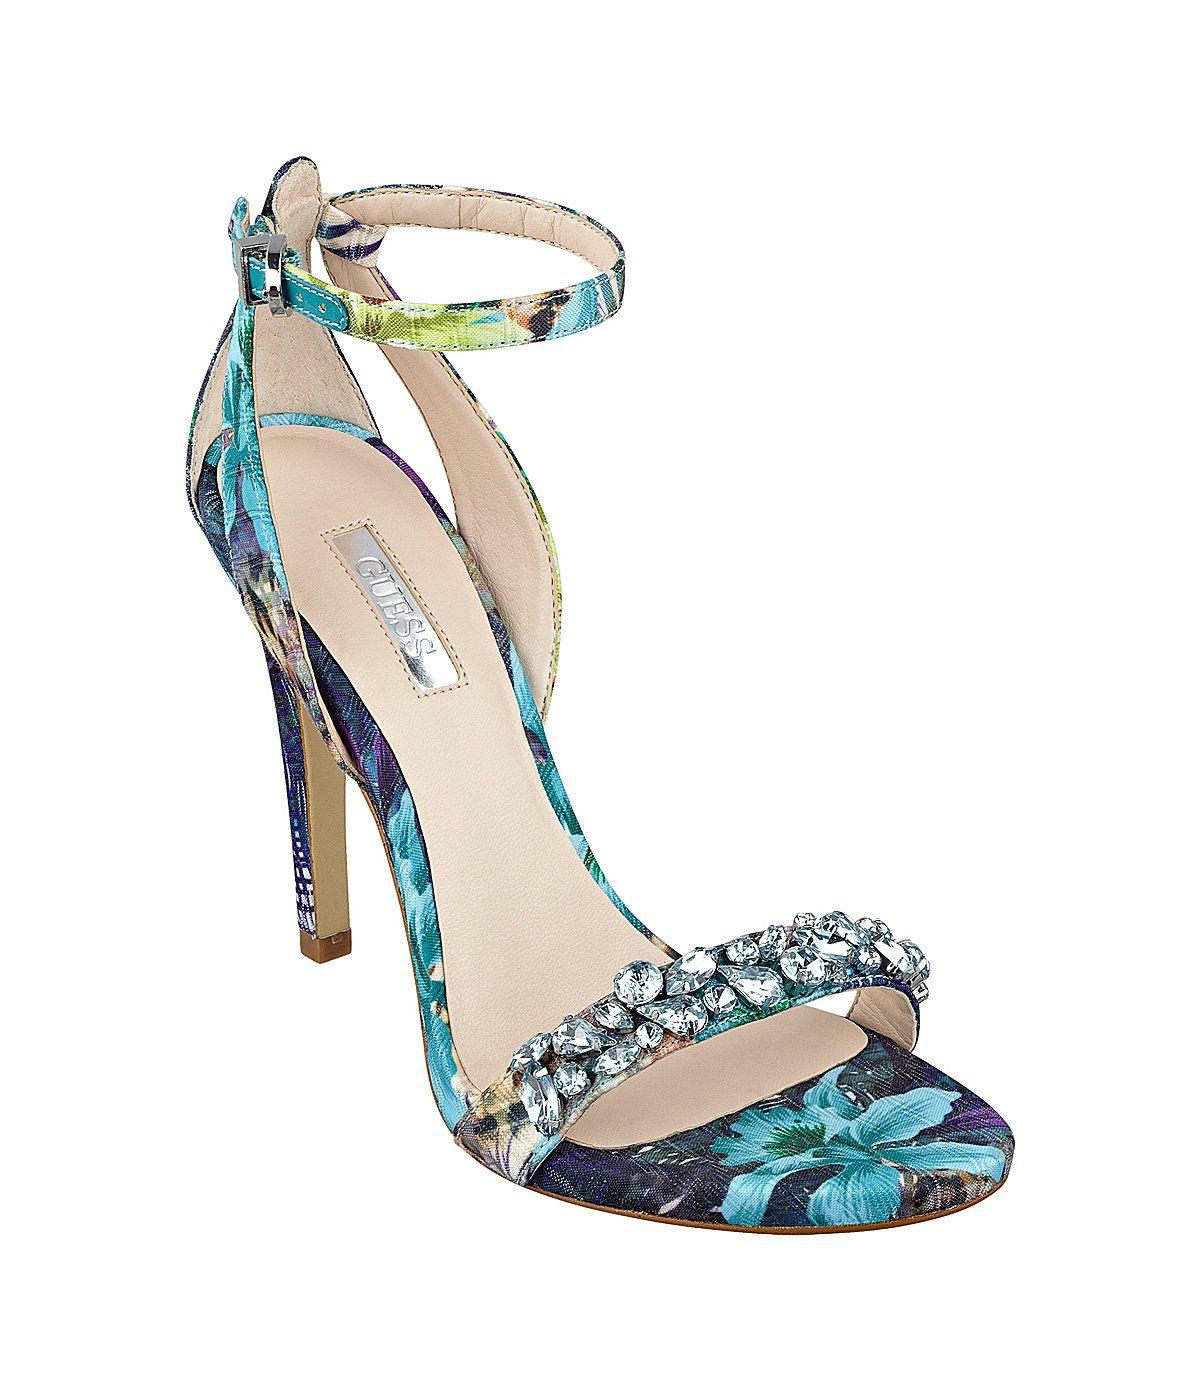 Guess Catarina4 Dress Sandals | Dillards.com